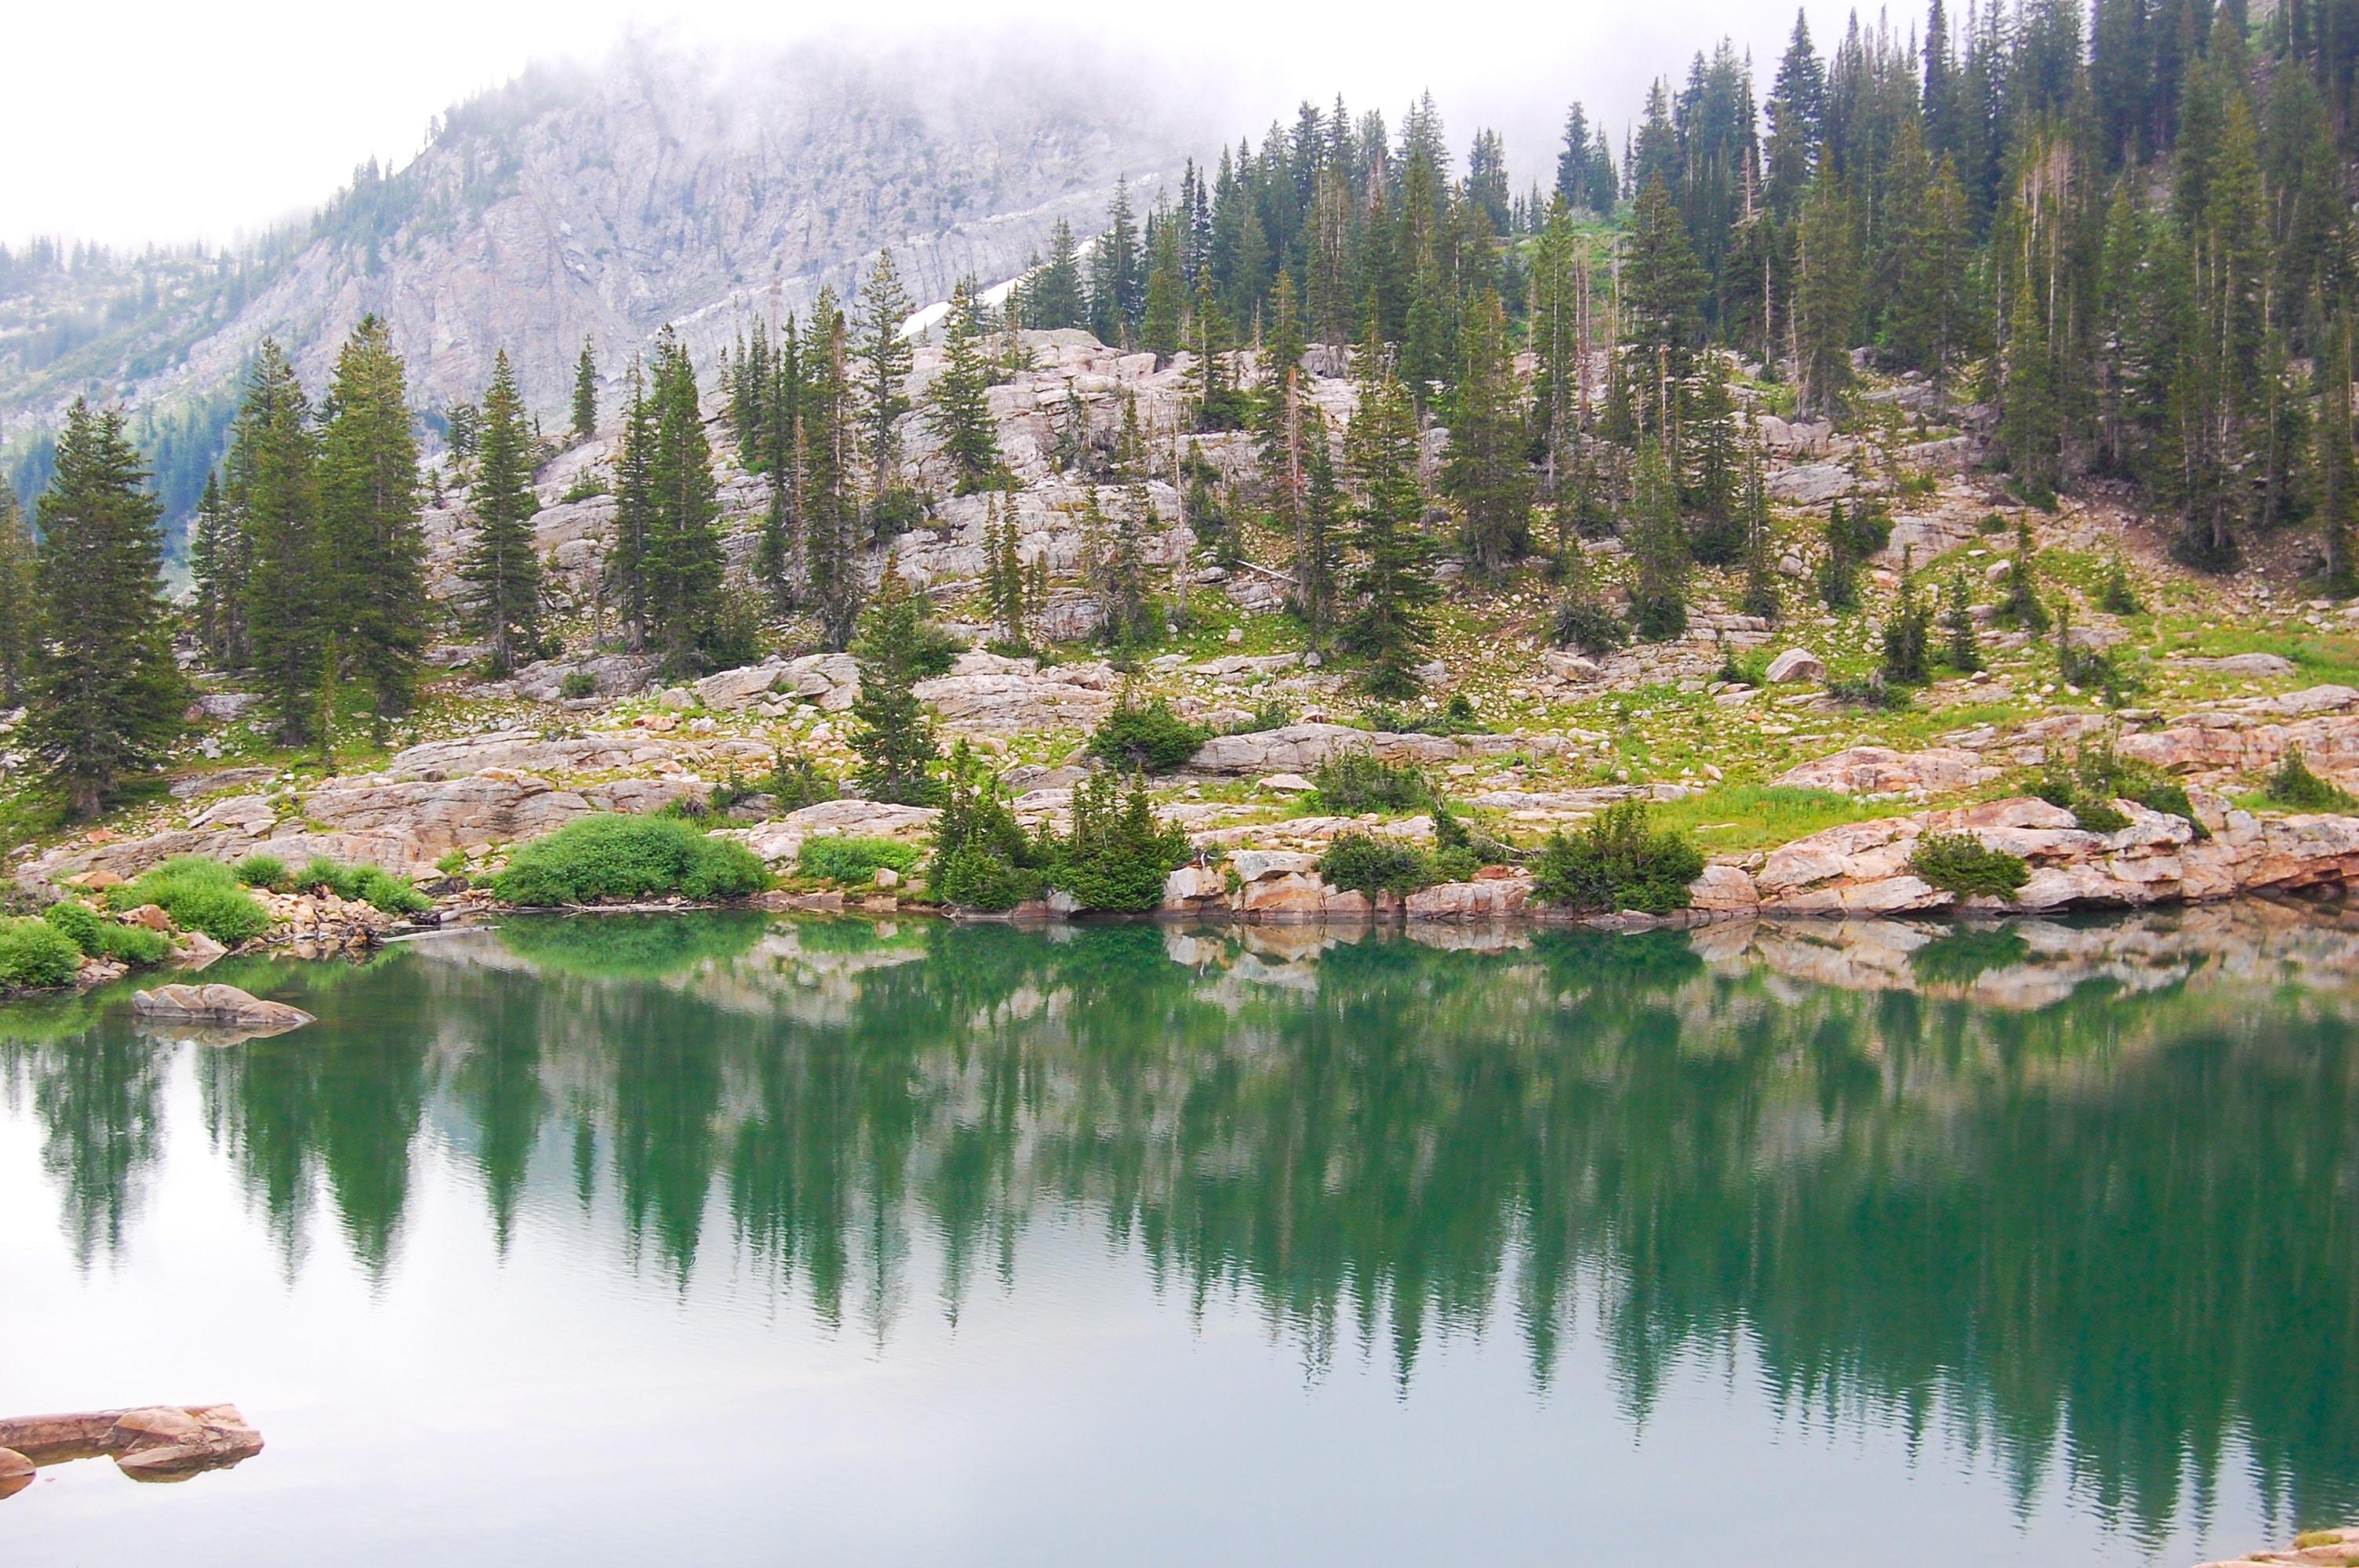 landscape photography of lake near trees